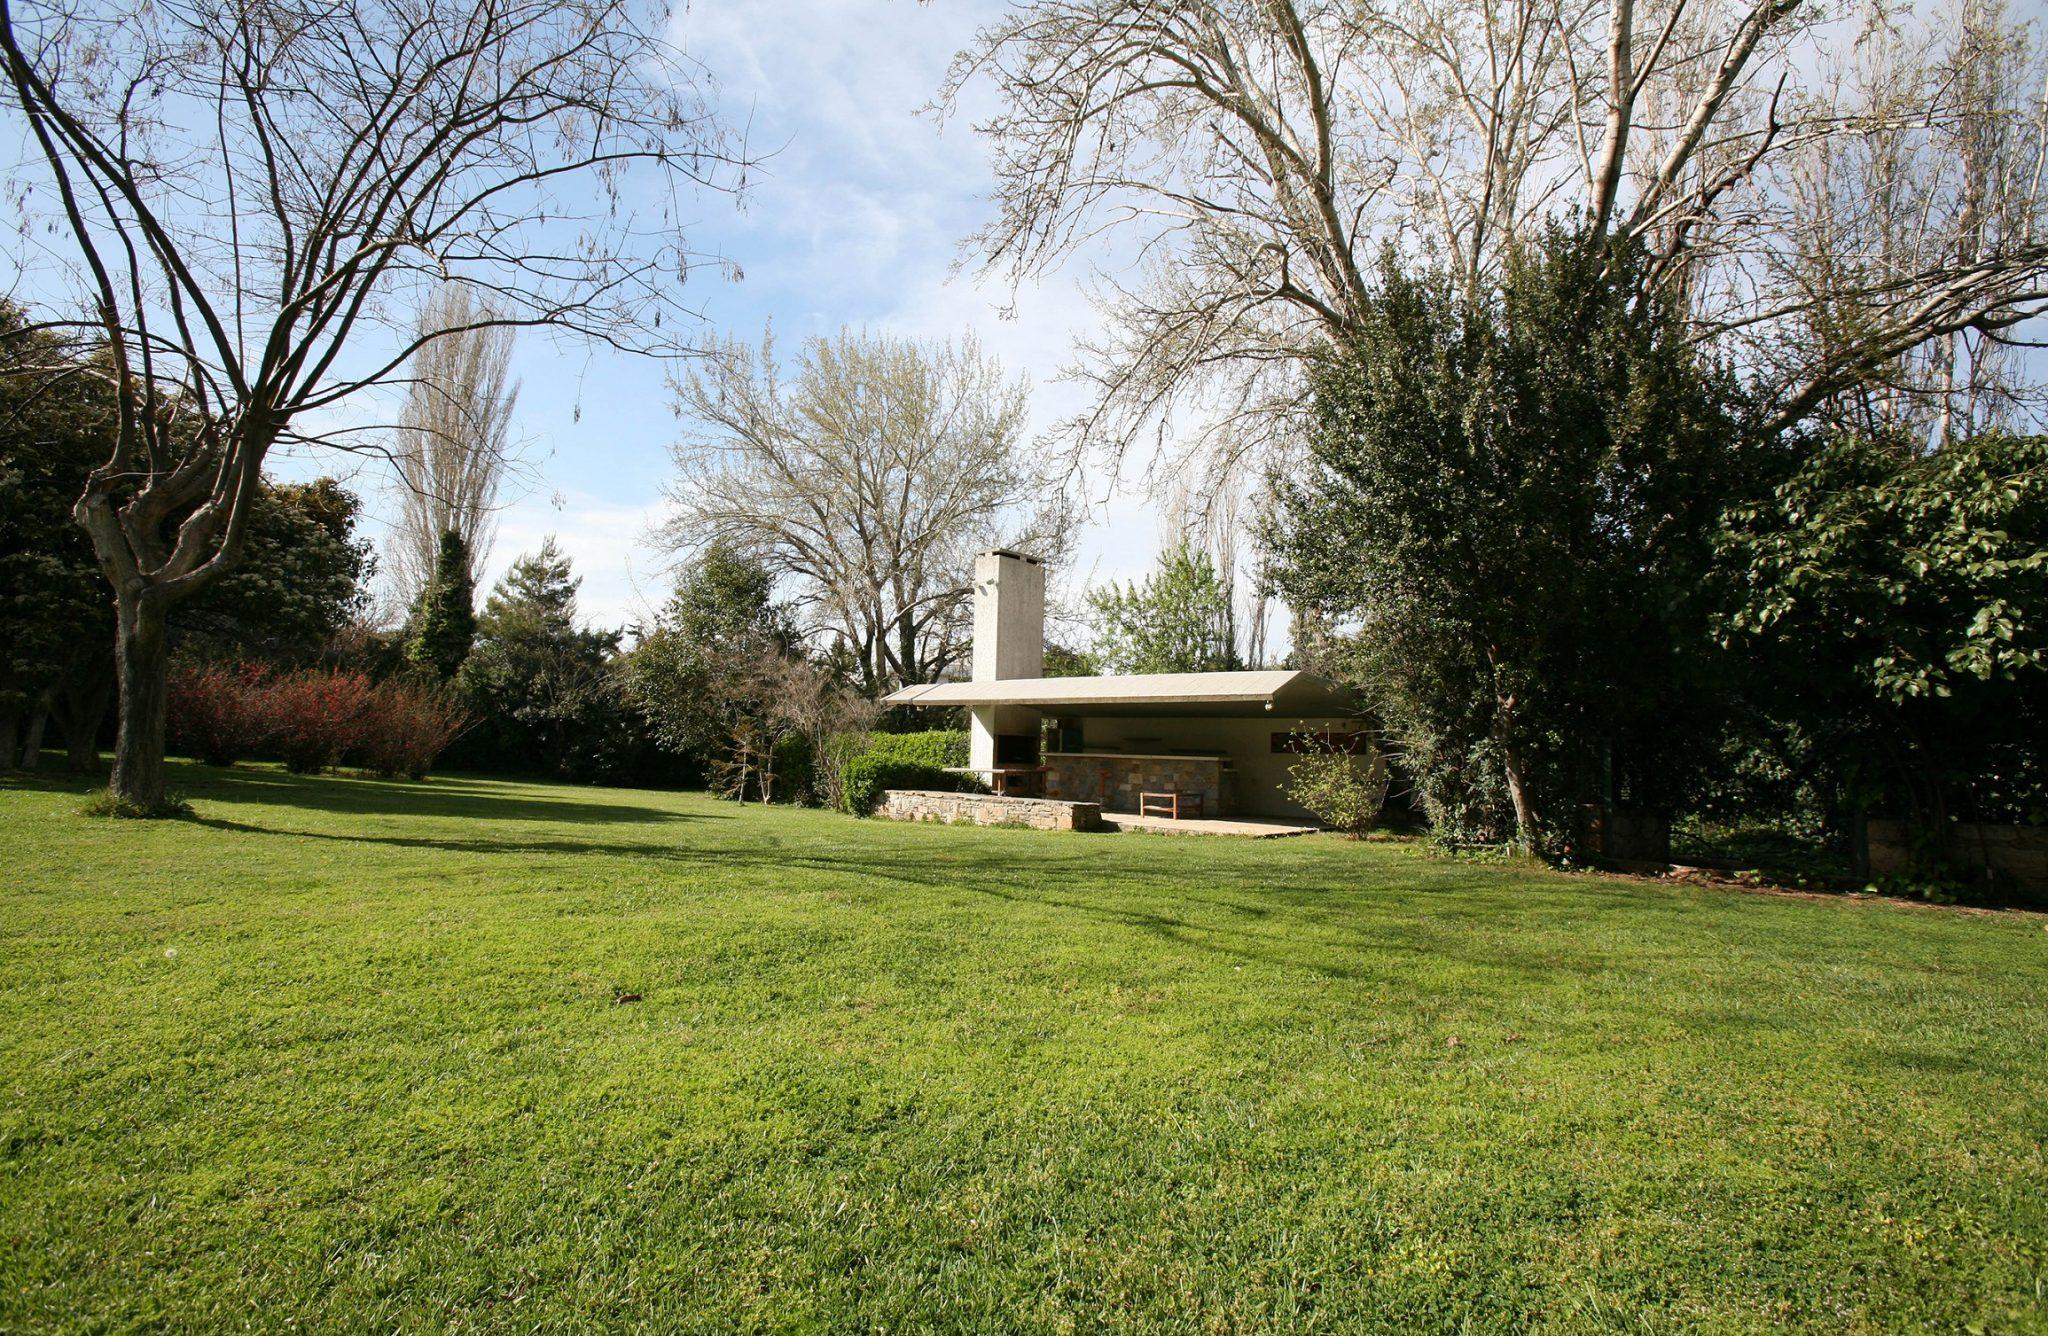 Maison, Politeia - Ref GR-4887